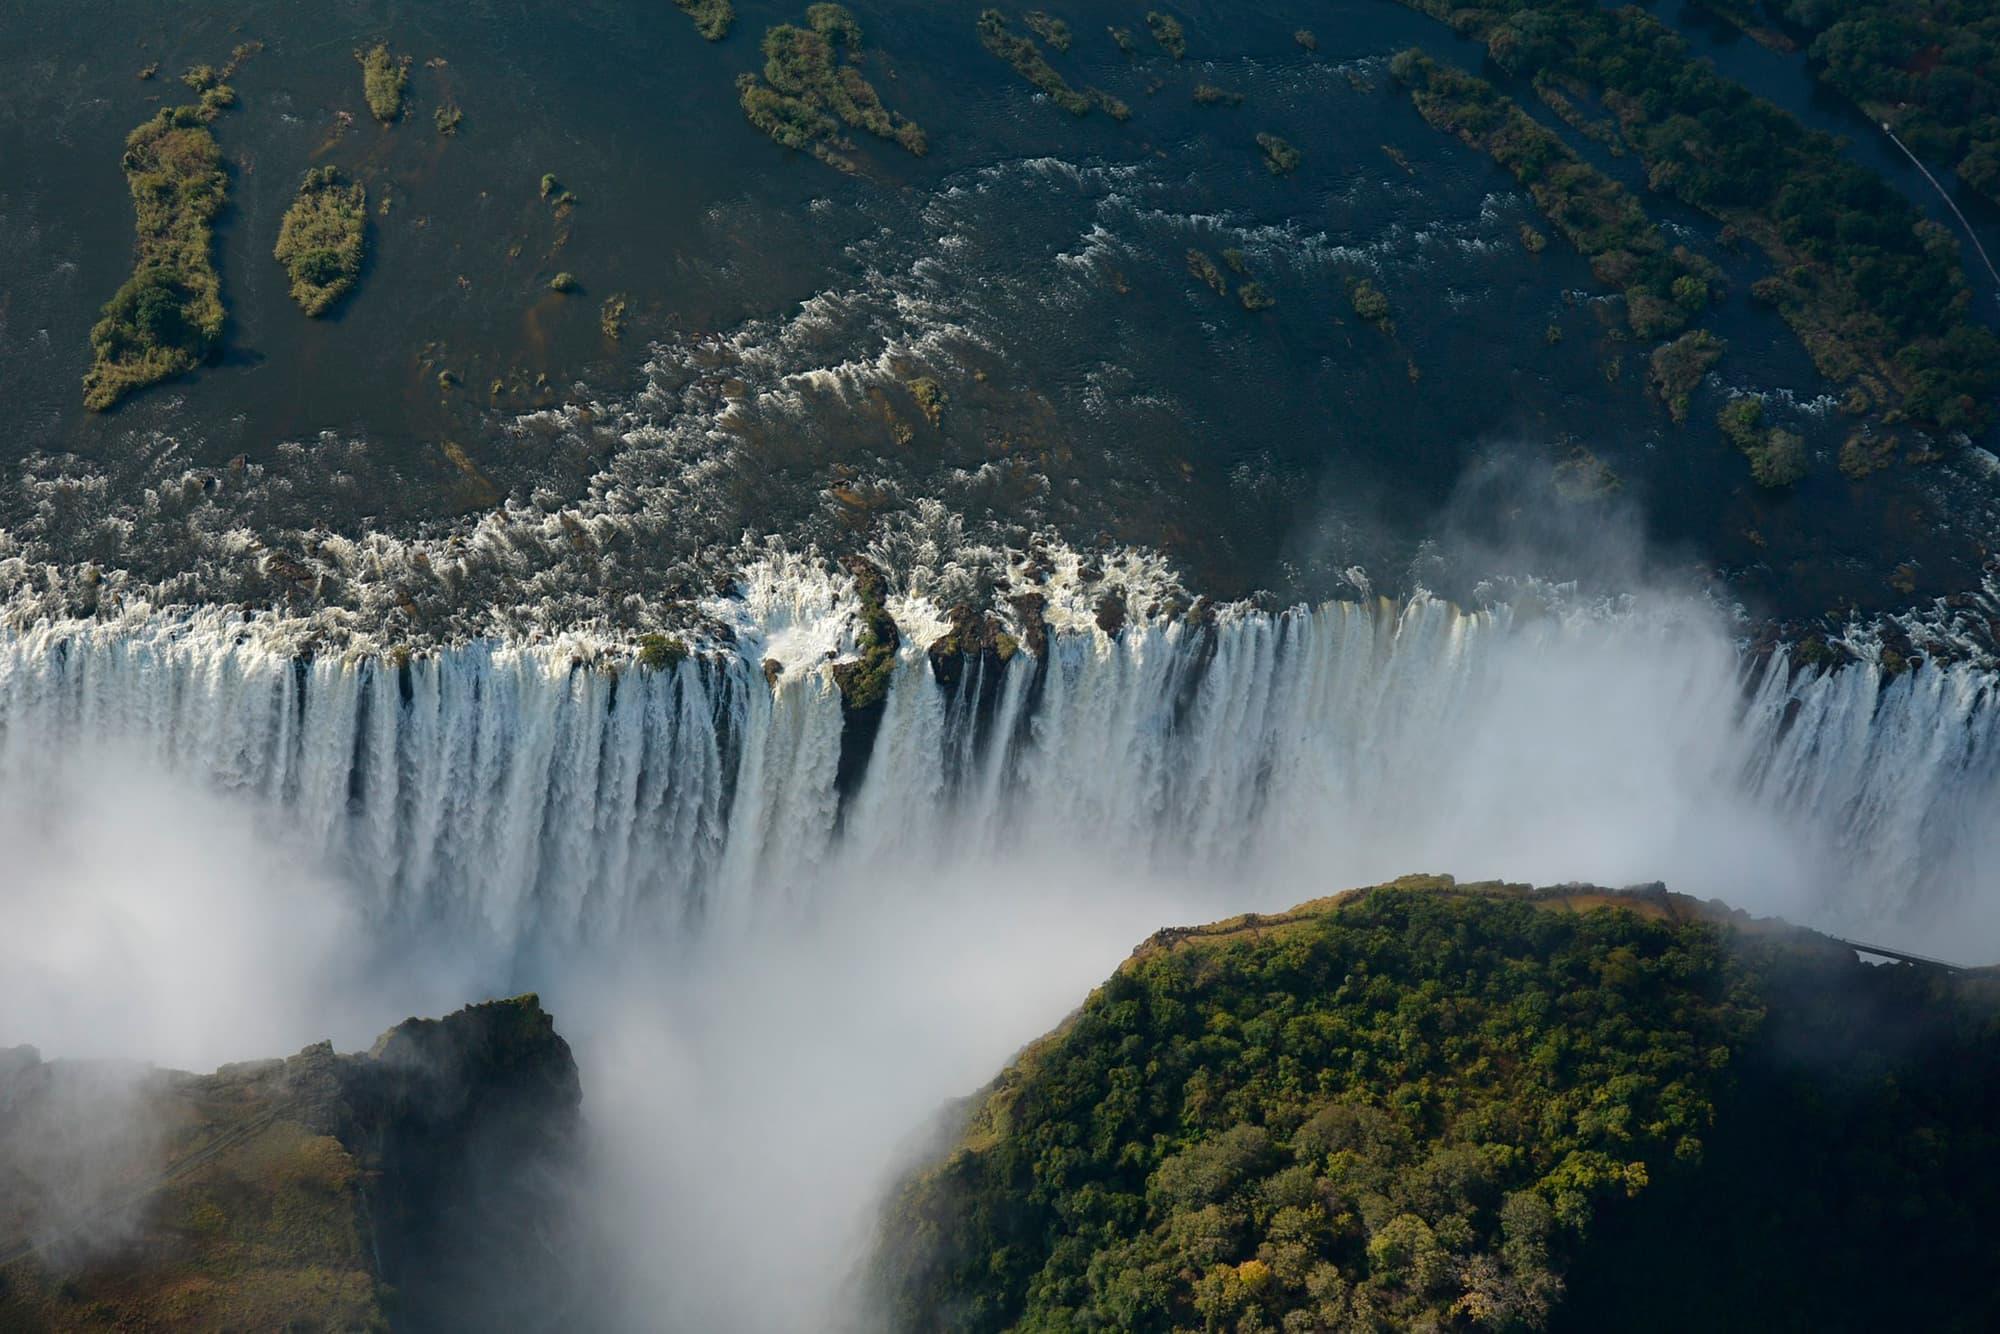 Gran Tour de Sudáfrica, Cataratas Victoria e isla Mauricio - Sudáfrica- imagen #4